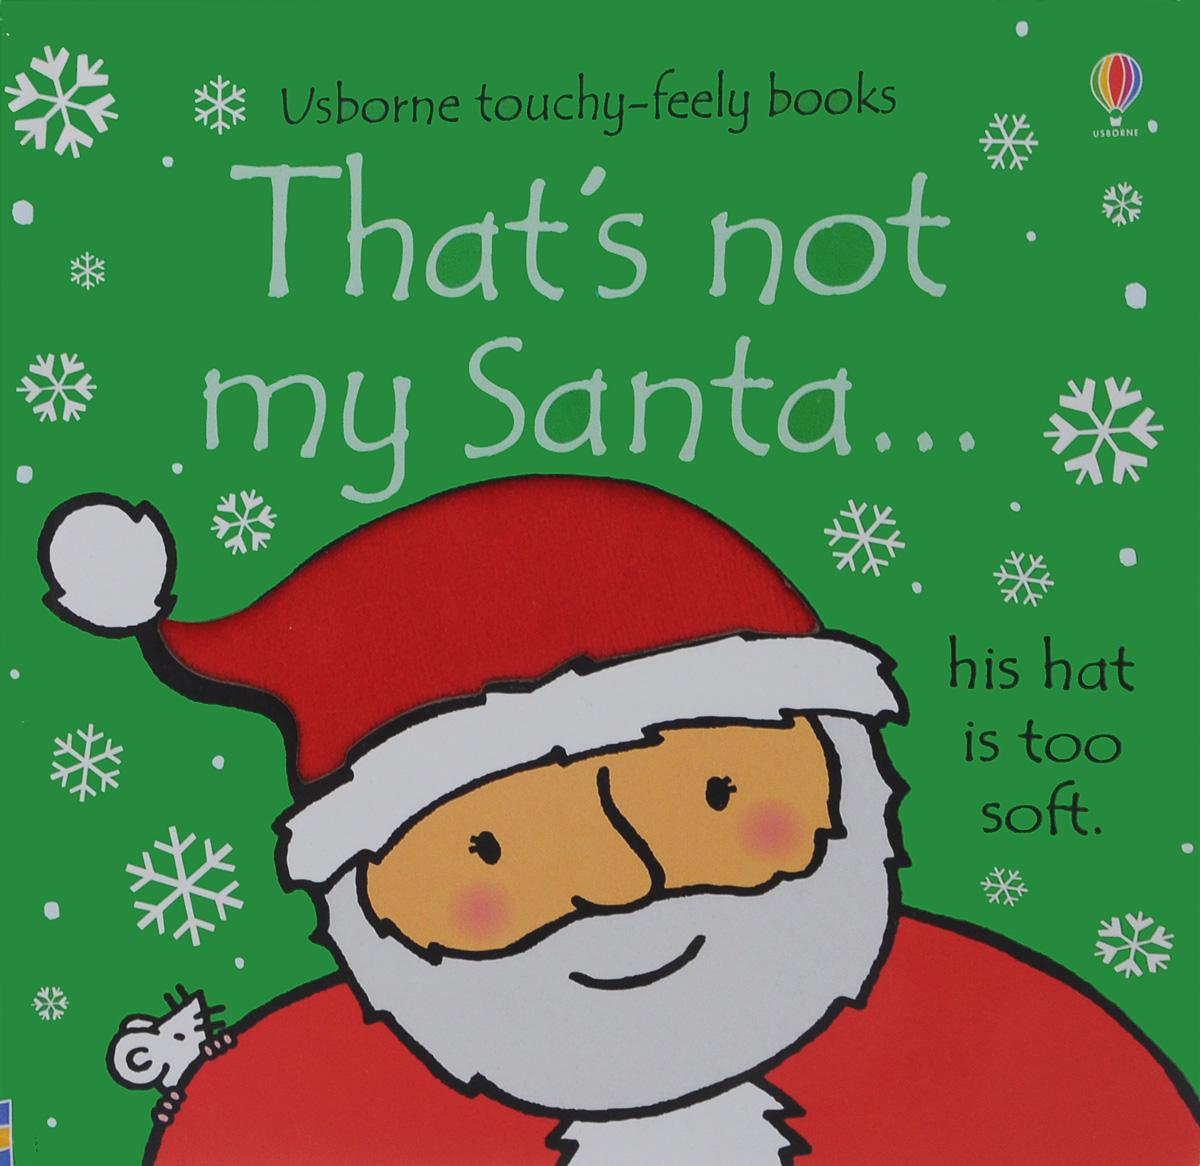 That's Not My Santa...